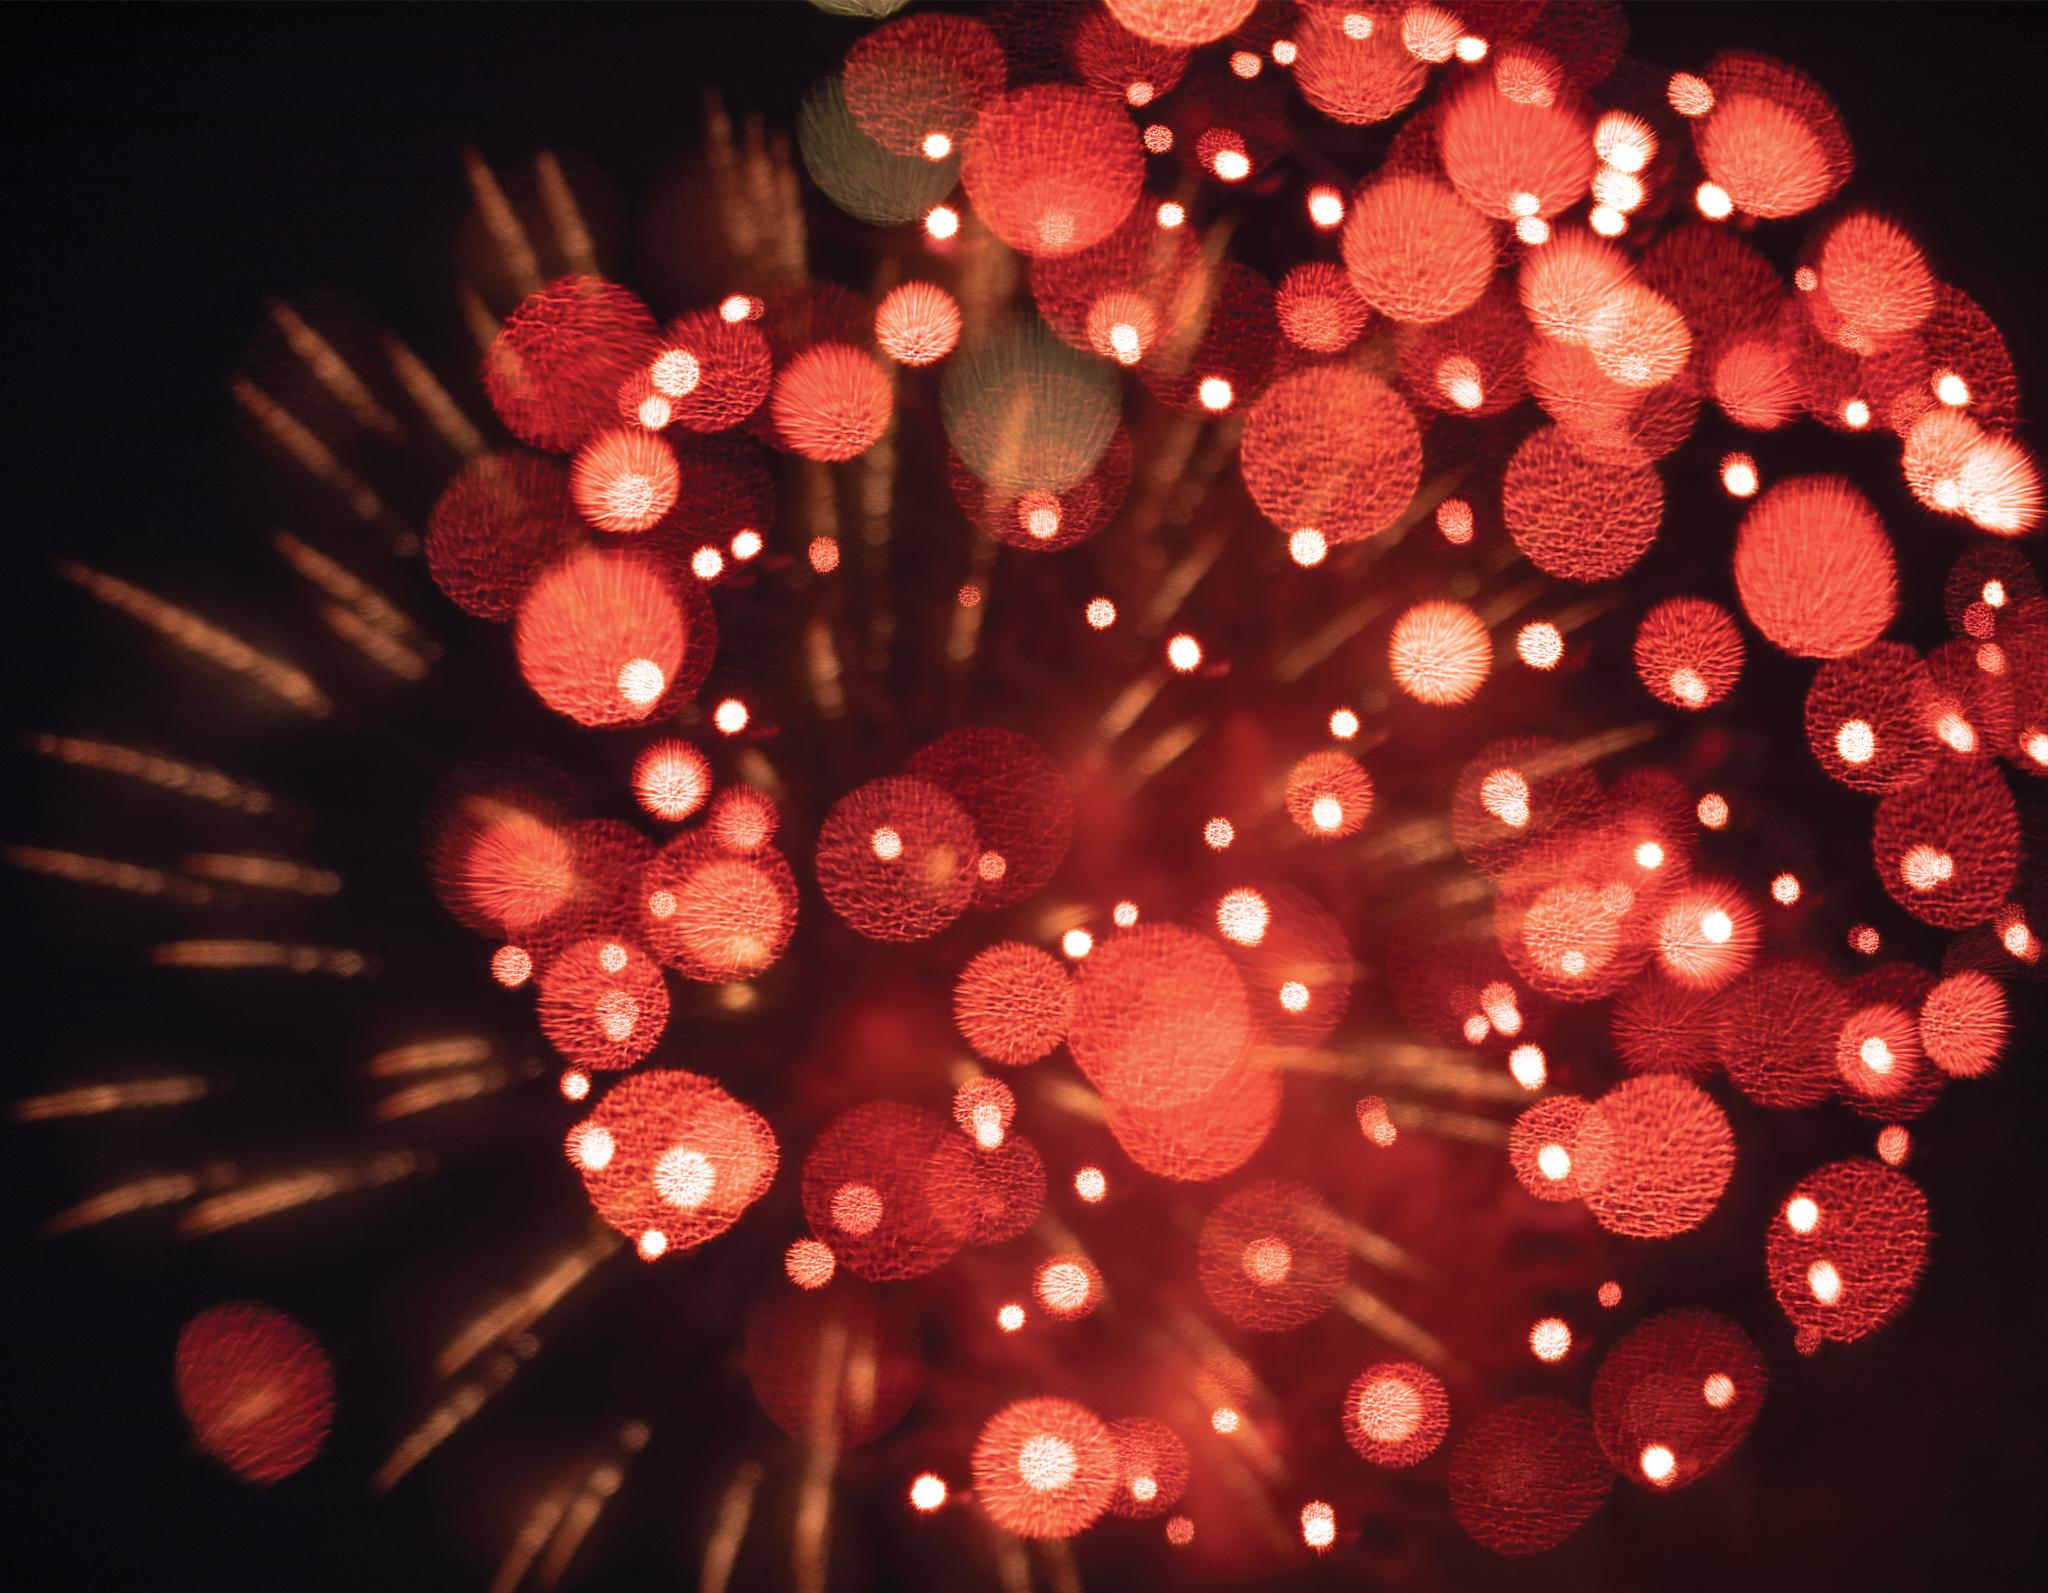 July: New Haven Fireworks